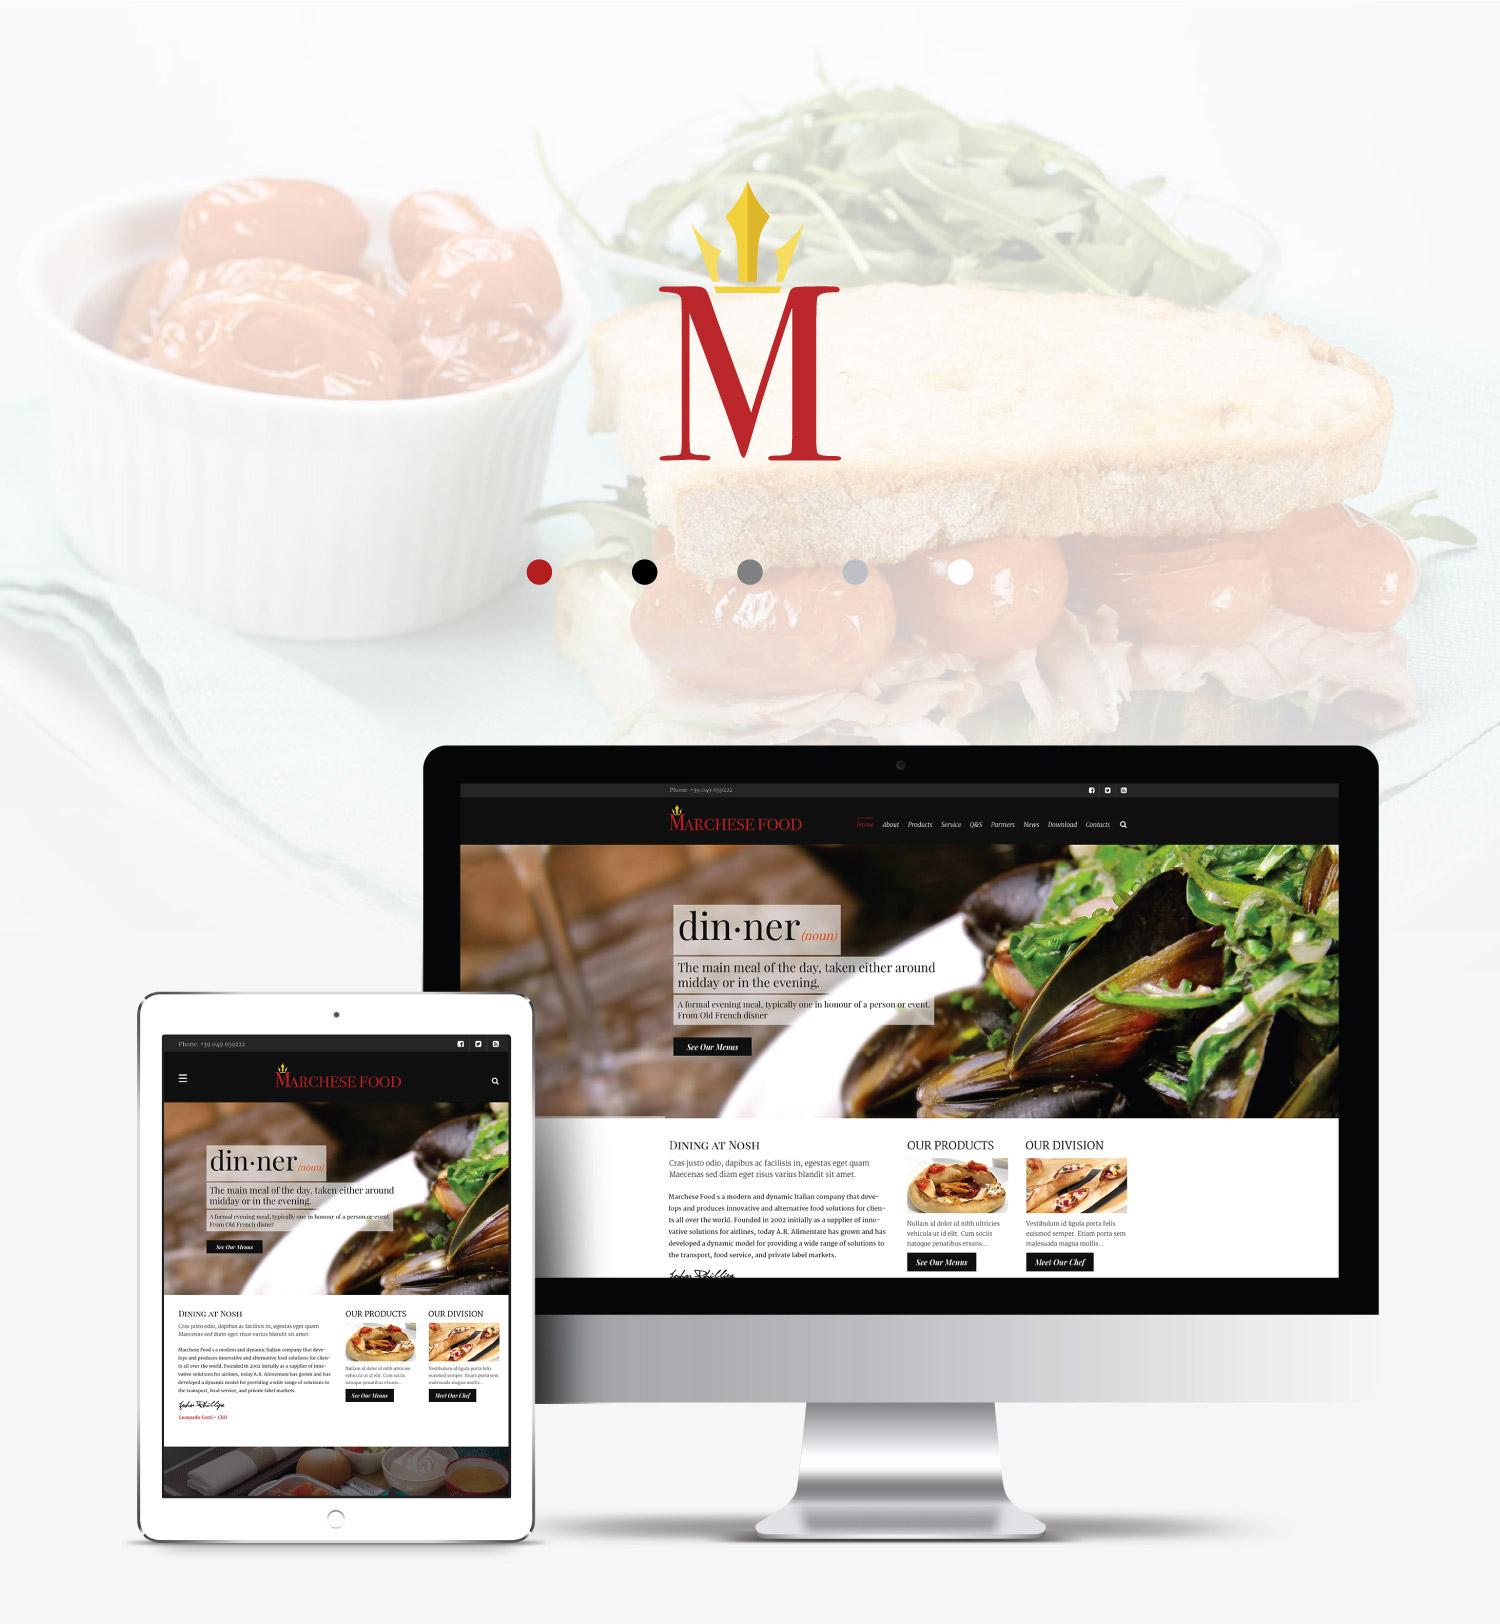 01_creazione_siti_internet_padova_marchese_food